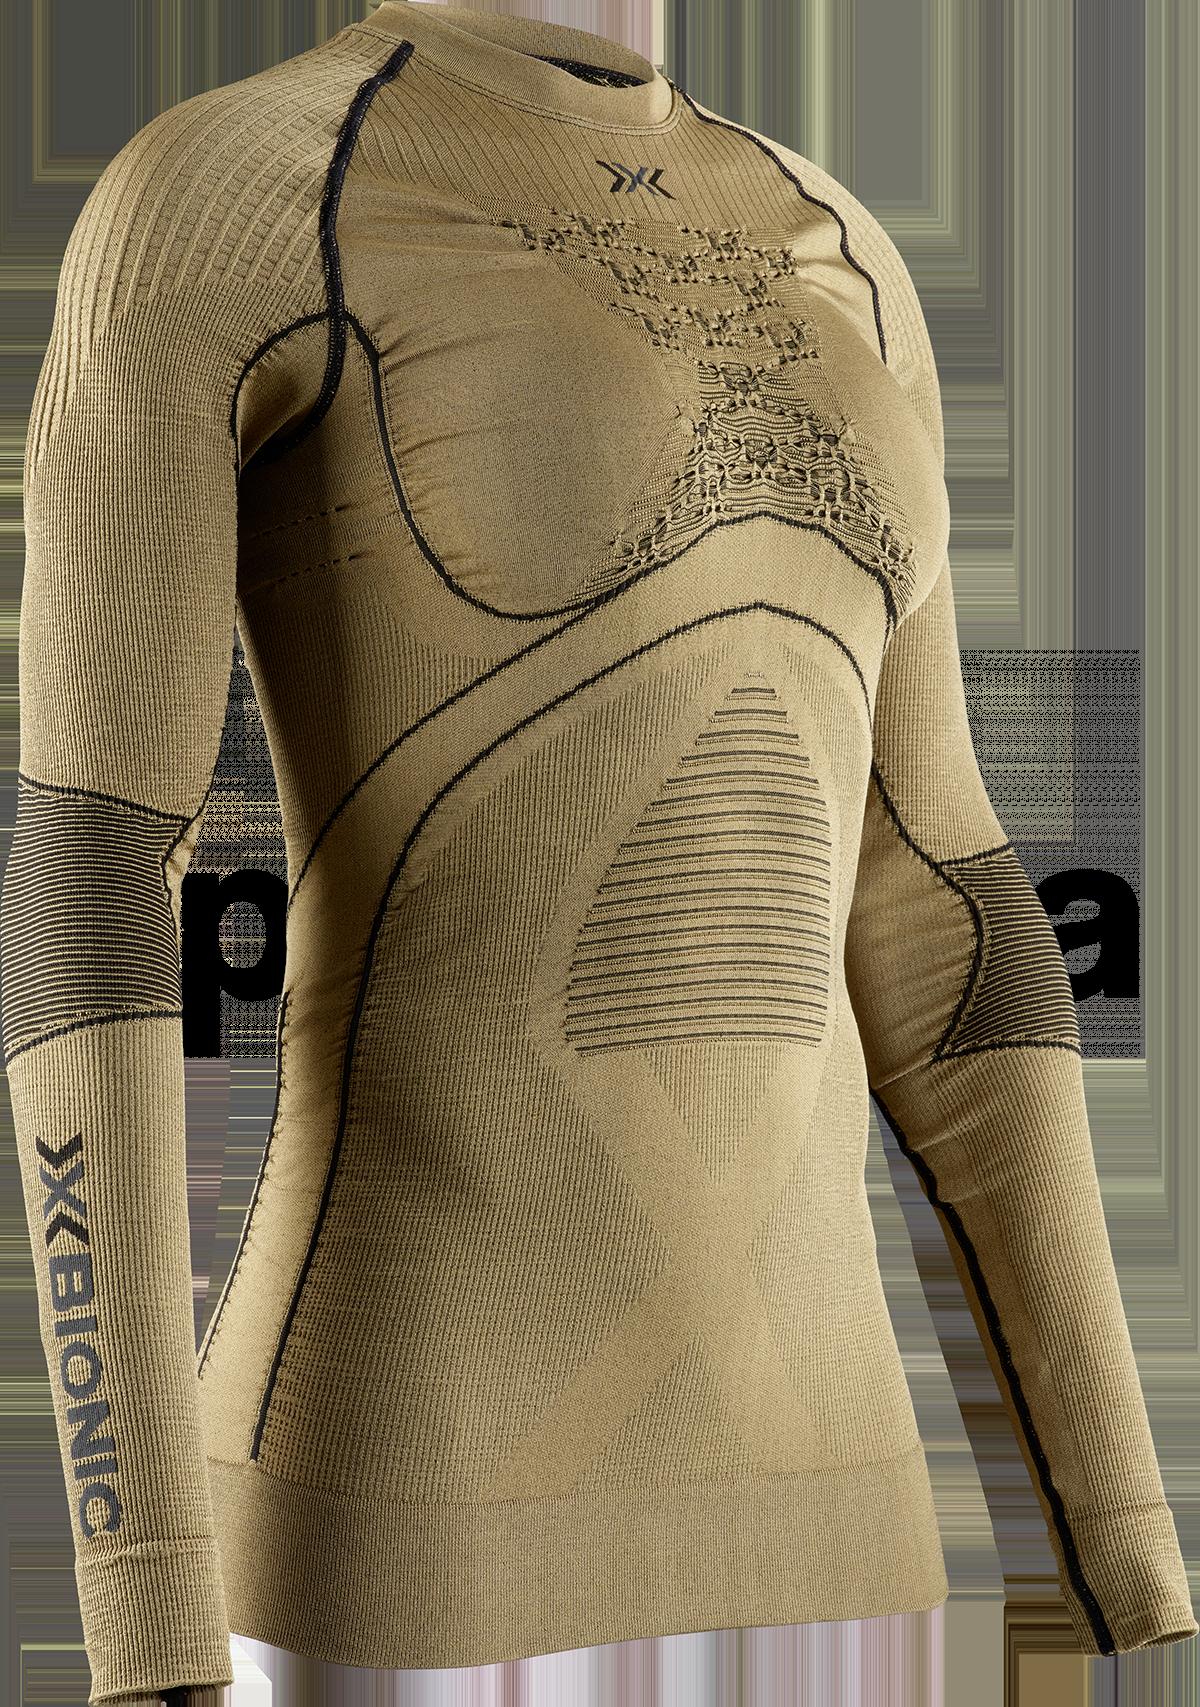 X-Bionic Radiactor 4.0 Shirt round neck LG SL W